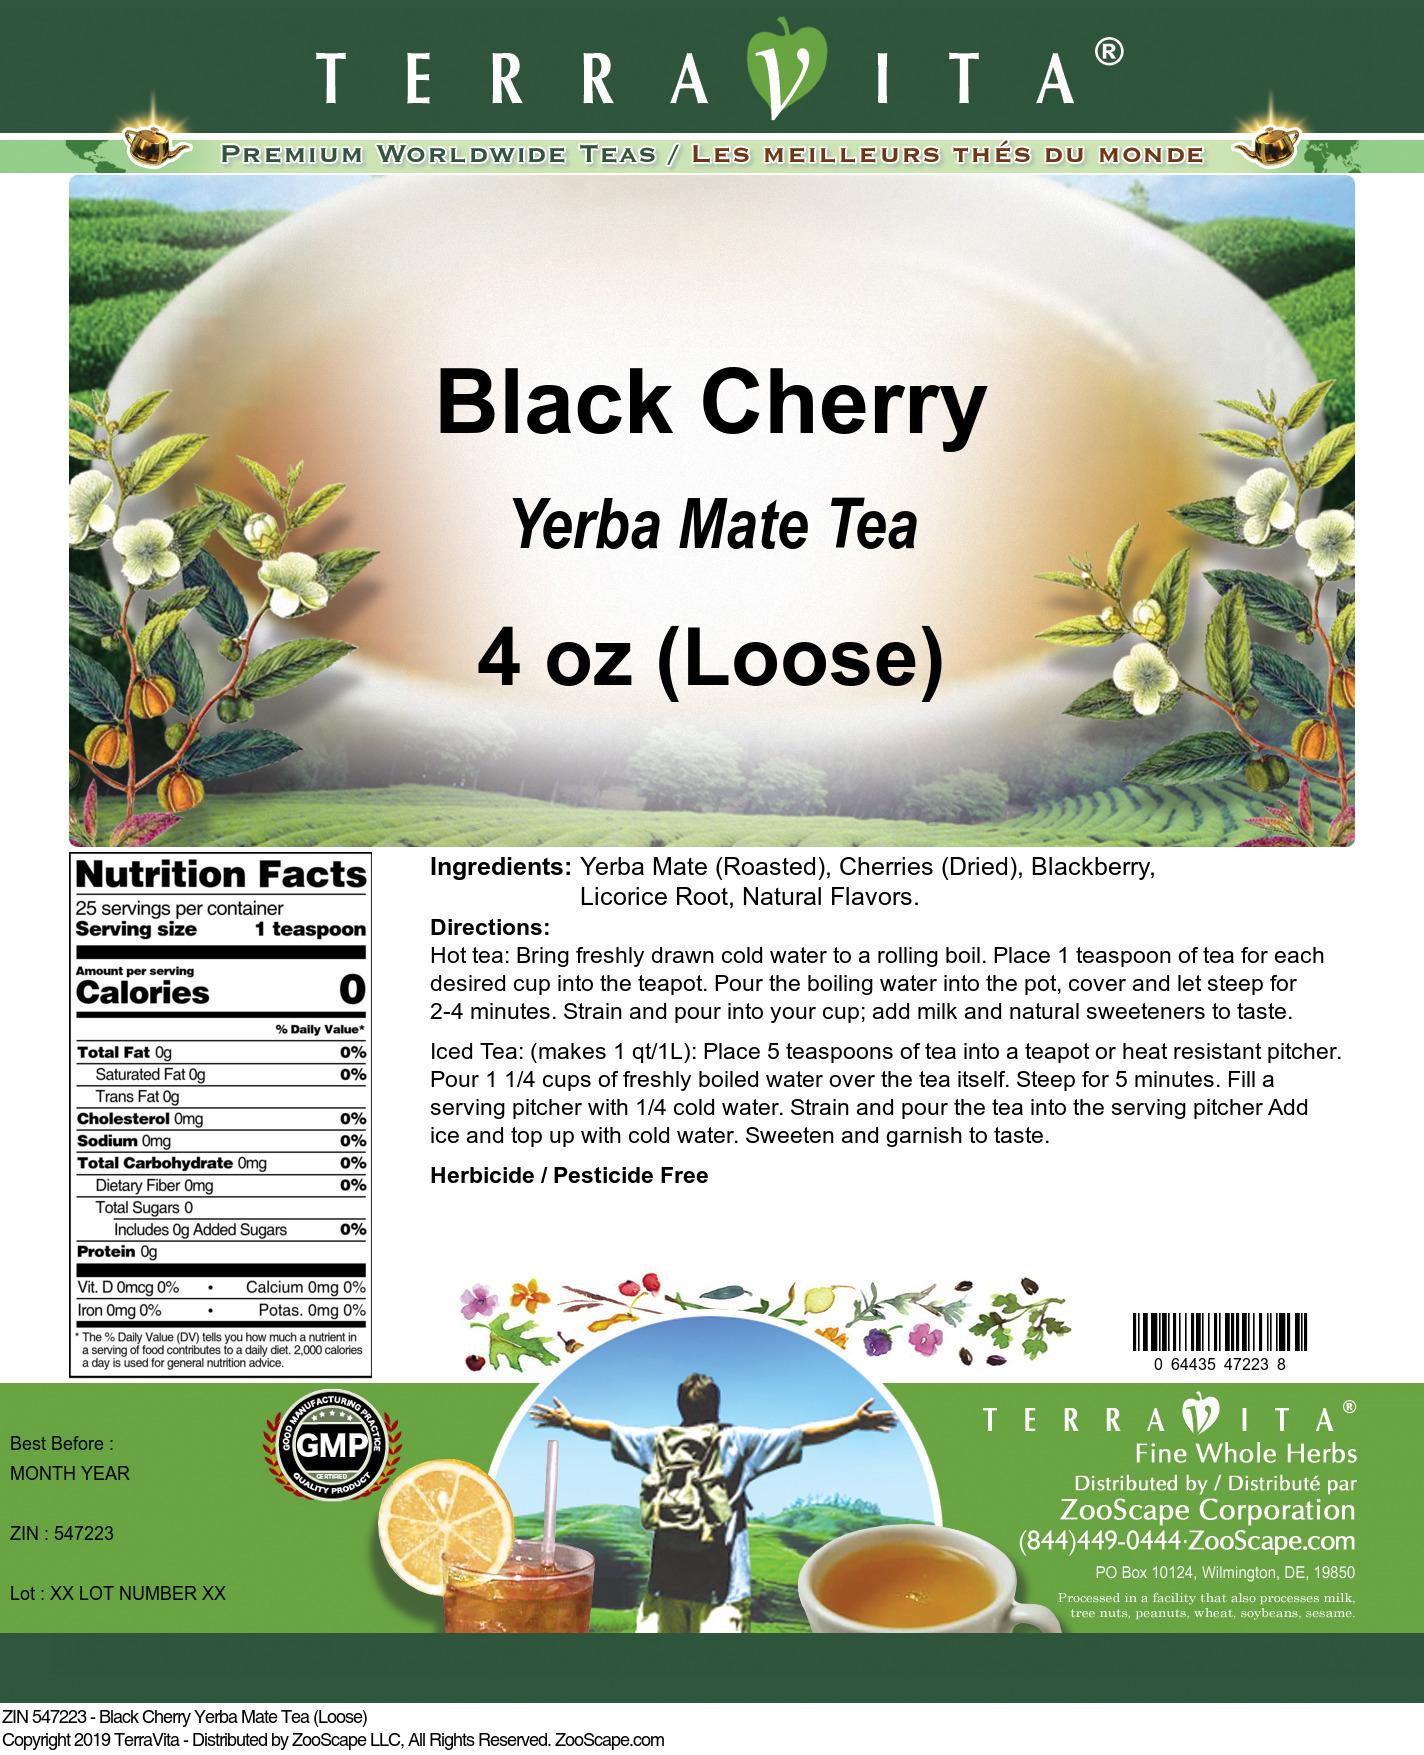 Black Cherry Yerba Mate Tea (Loose)